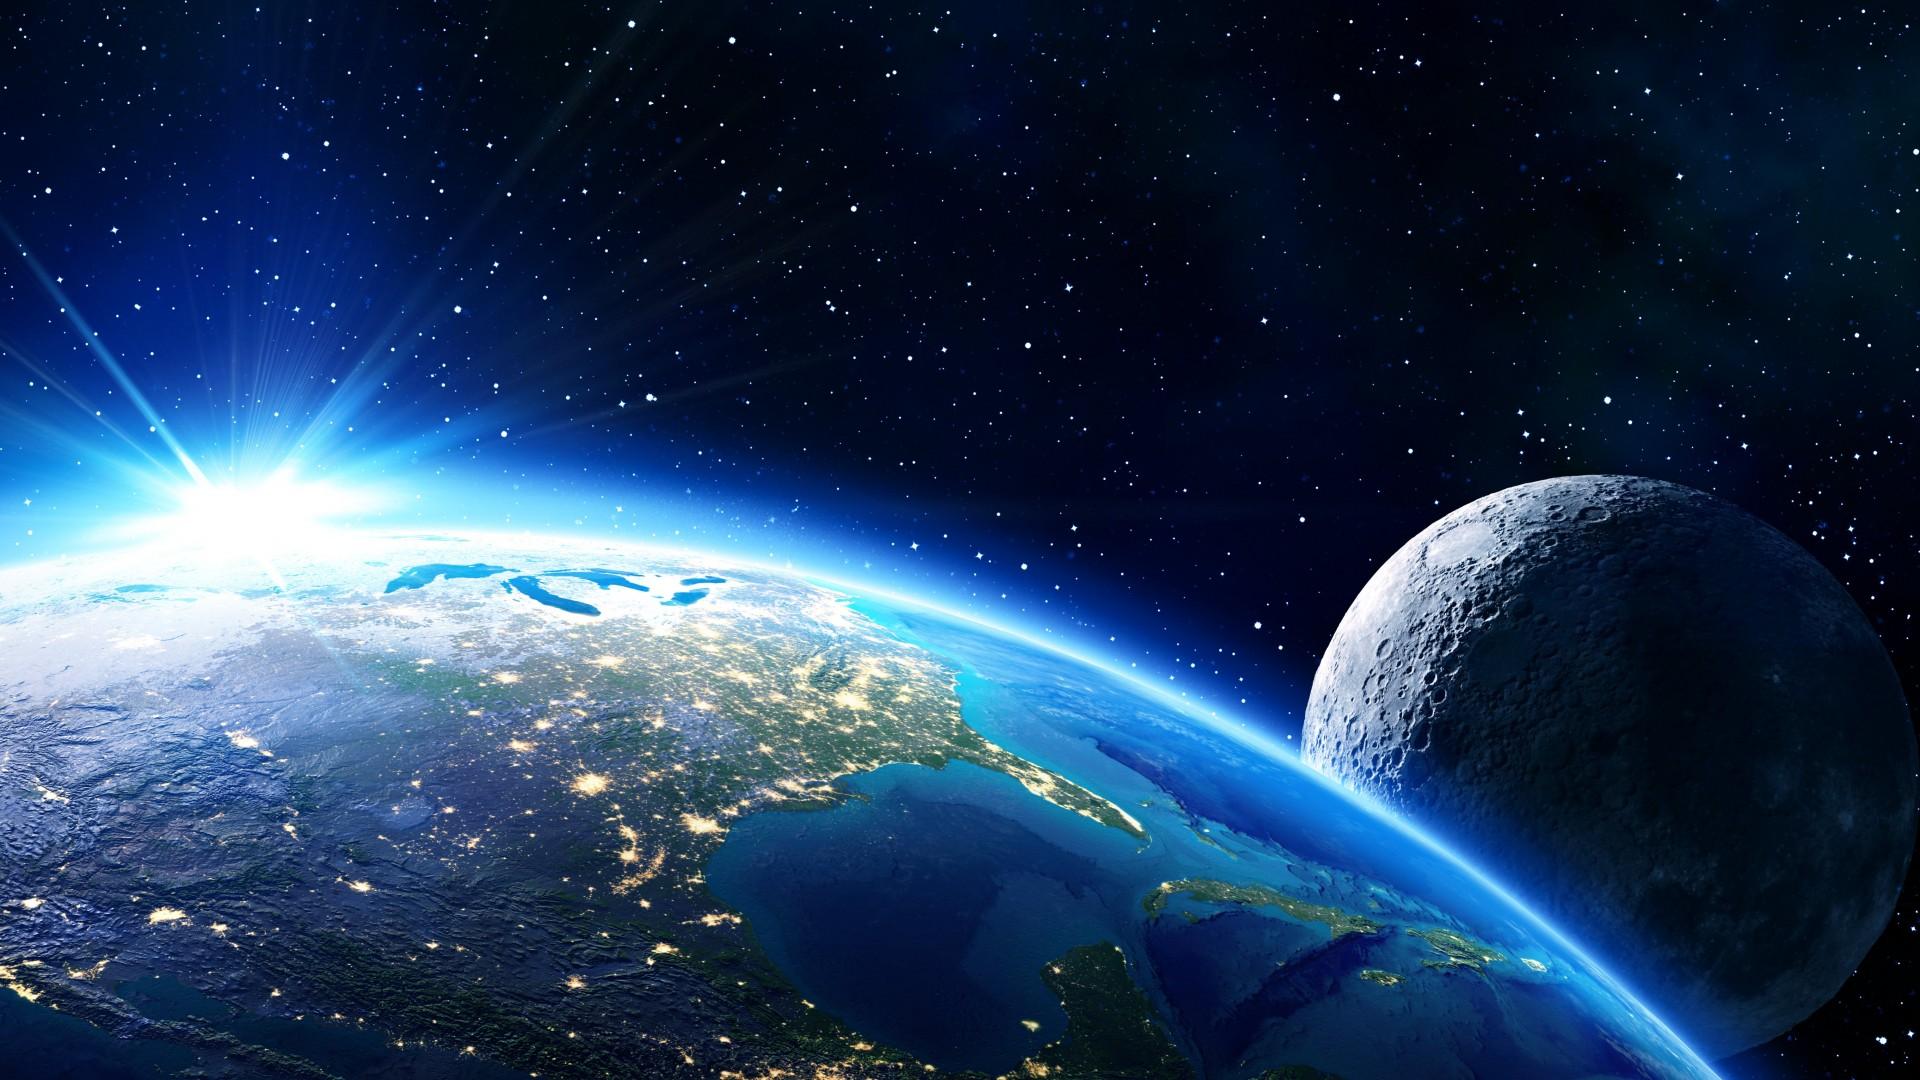 Wallpaper earth moon planet star 5k space 16639 - Space moon wallpaper ...